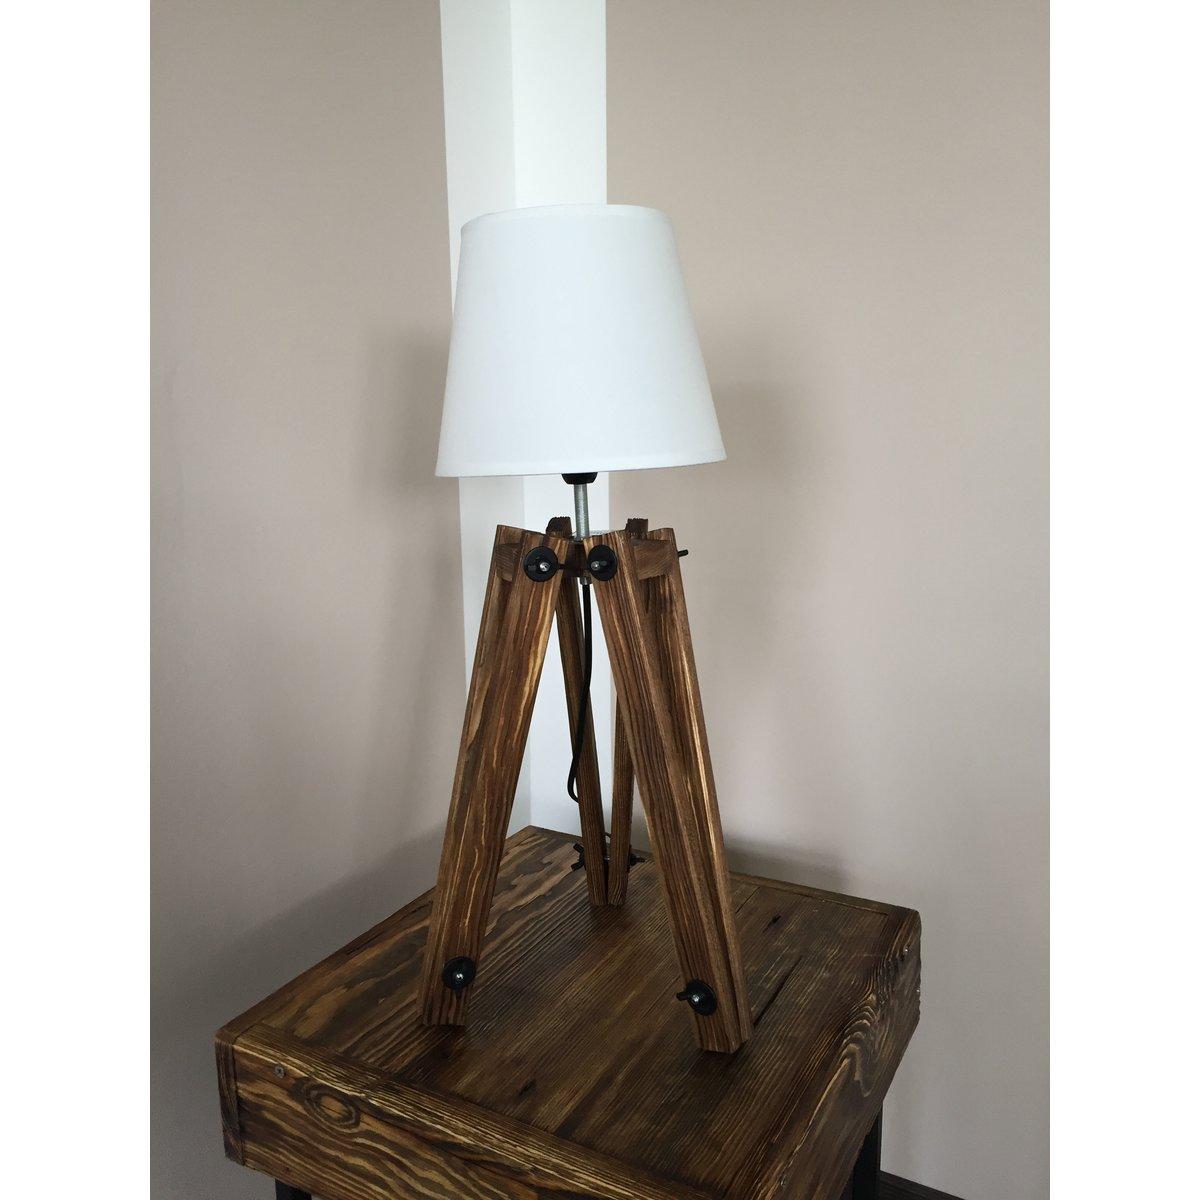 tripod lampe leuchte standleuchte altholz nachttischlampe schlafzimme 24 90. Black Bedroom Furniture Sets. Home Design Ideas